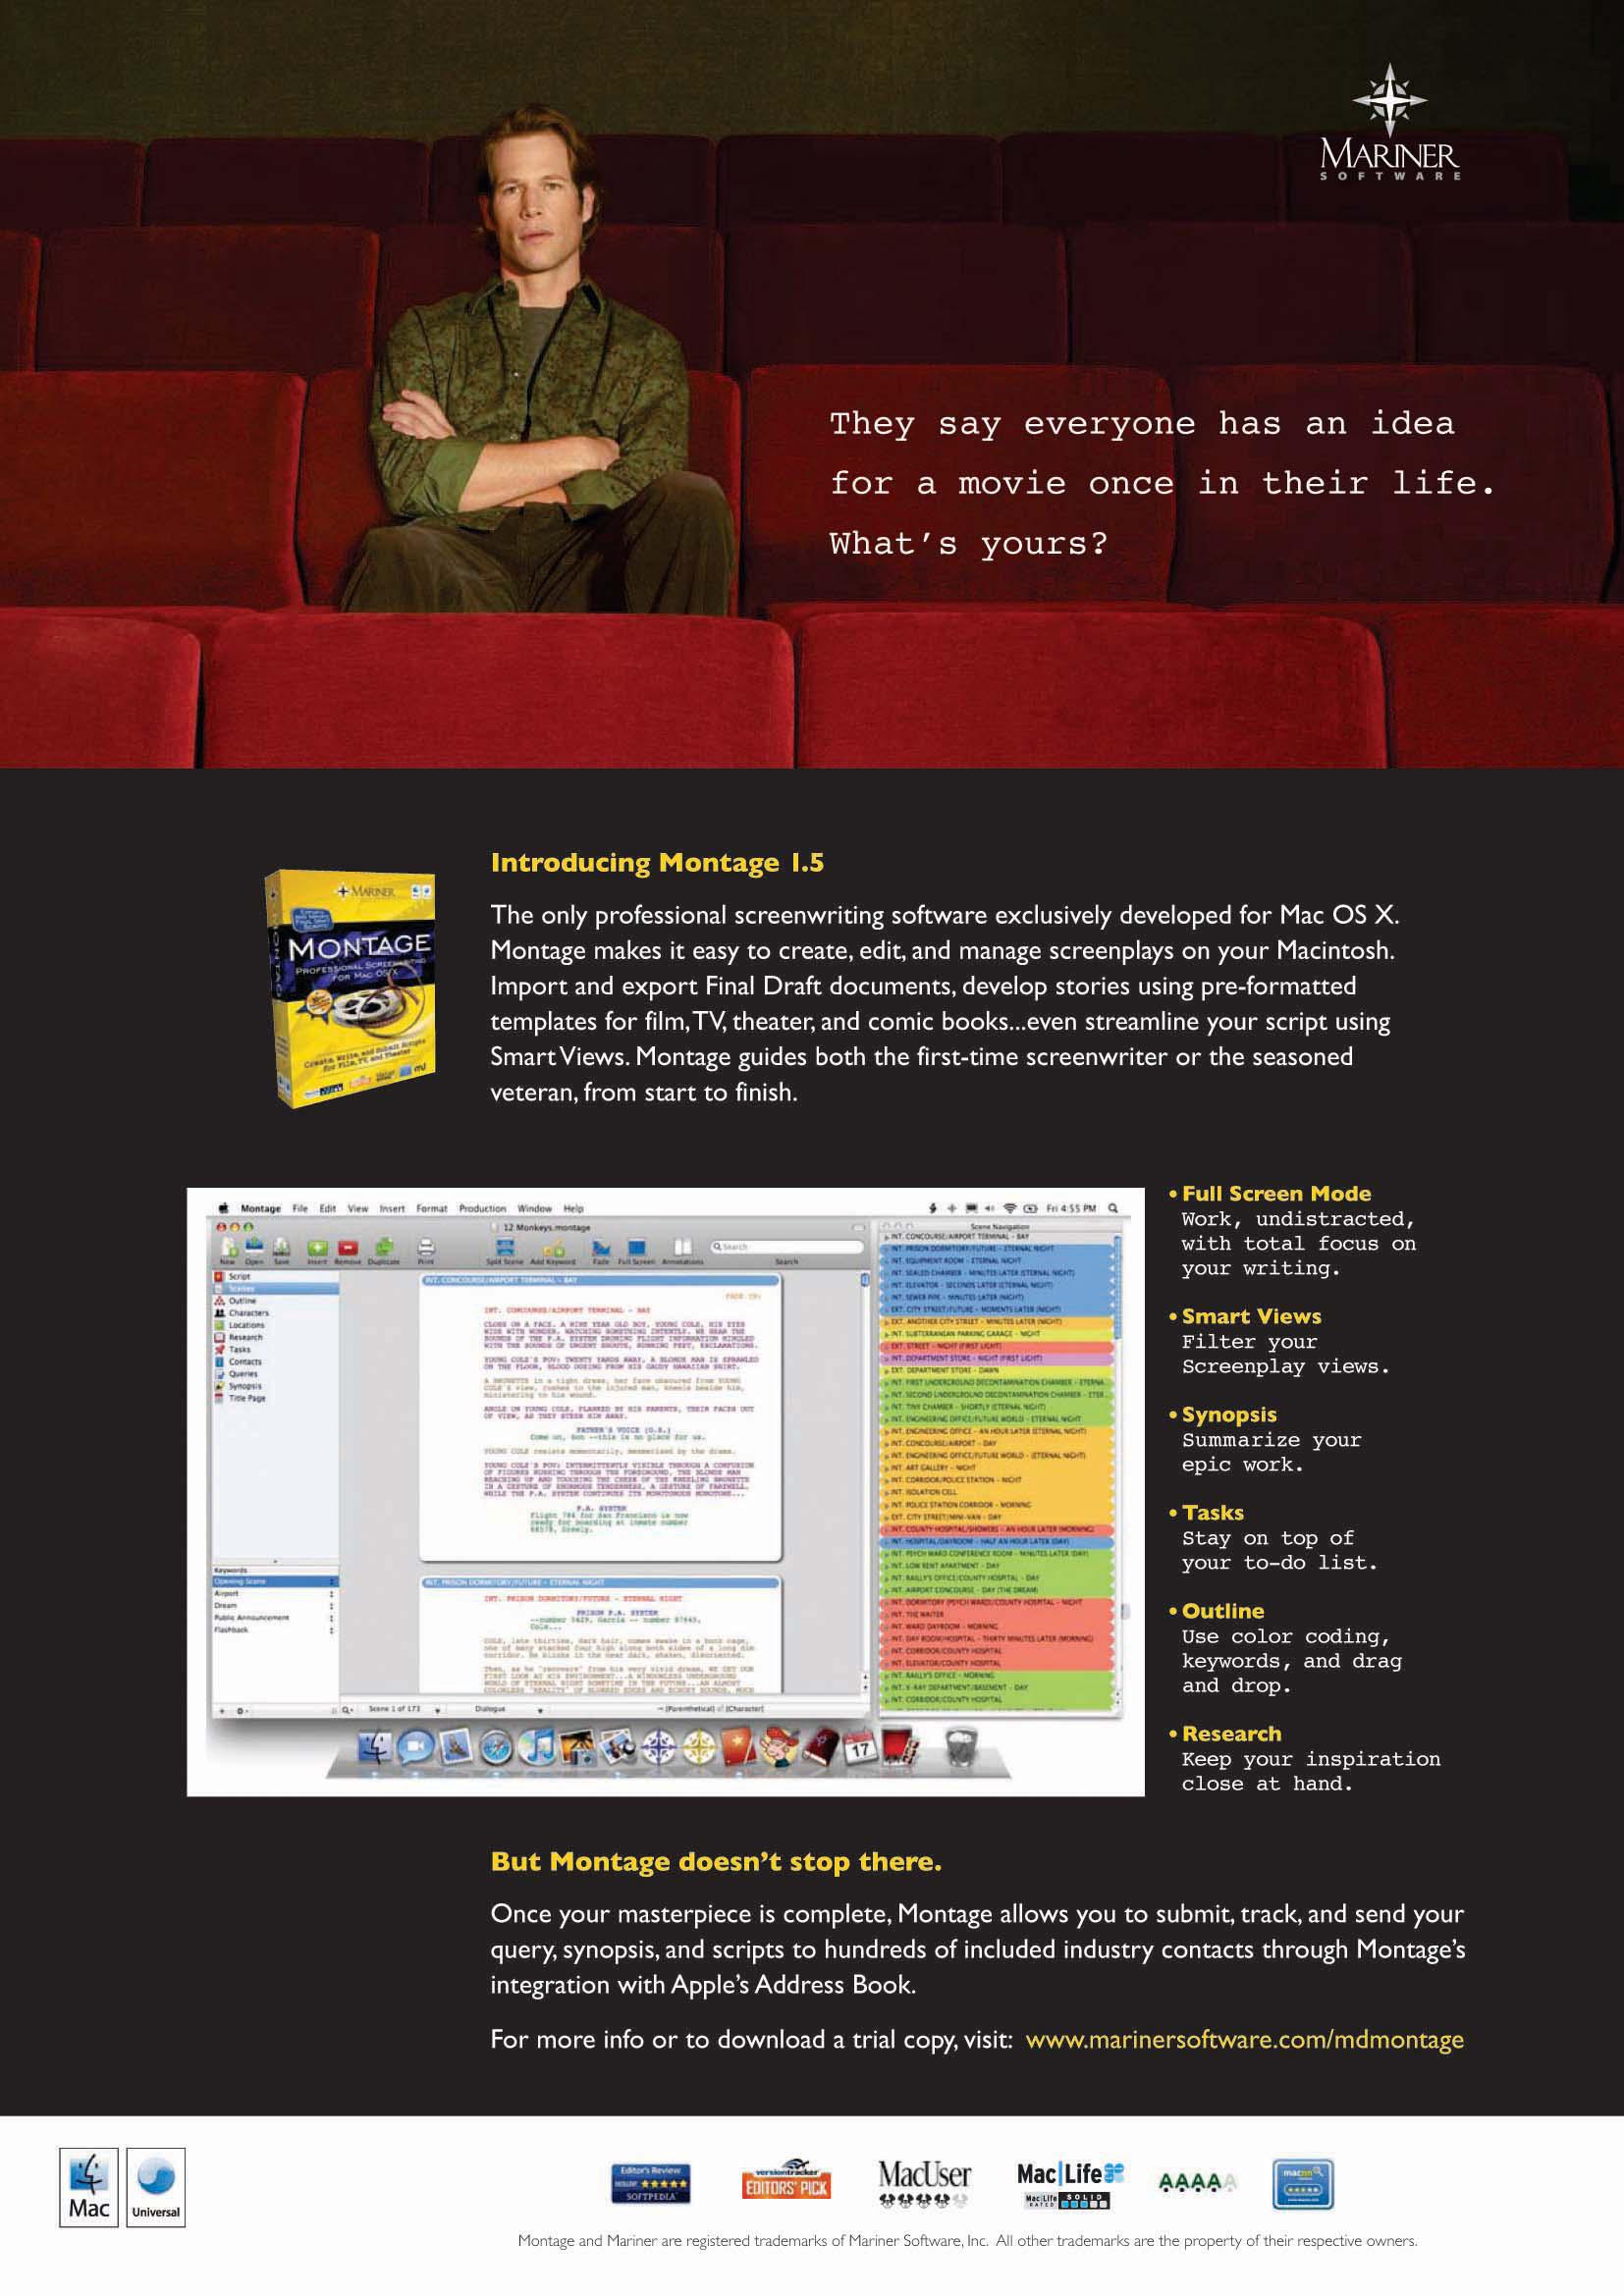 Mariner Software MovieScope Ad.jpg